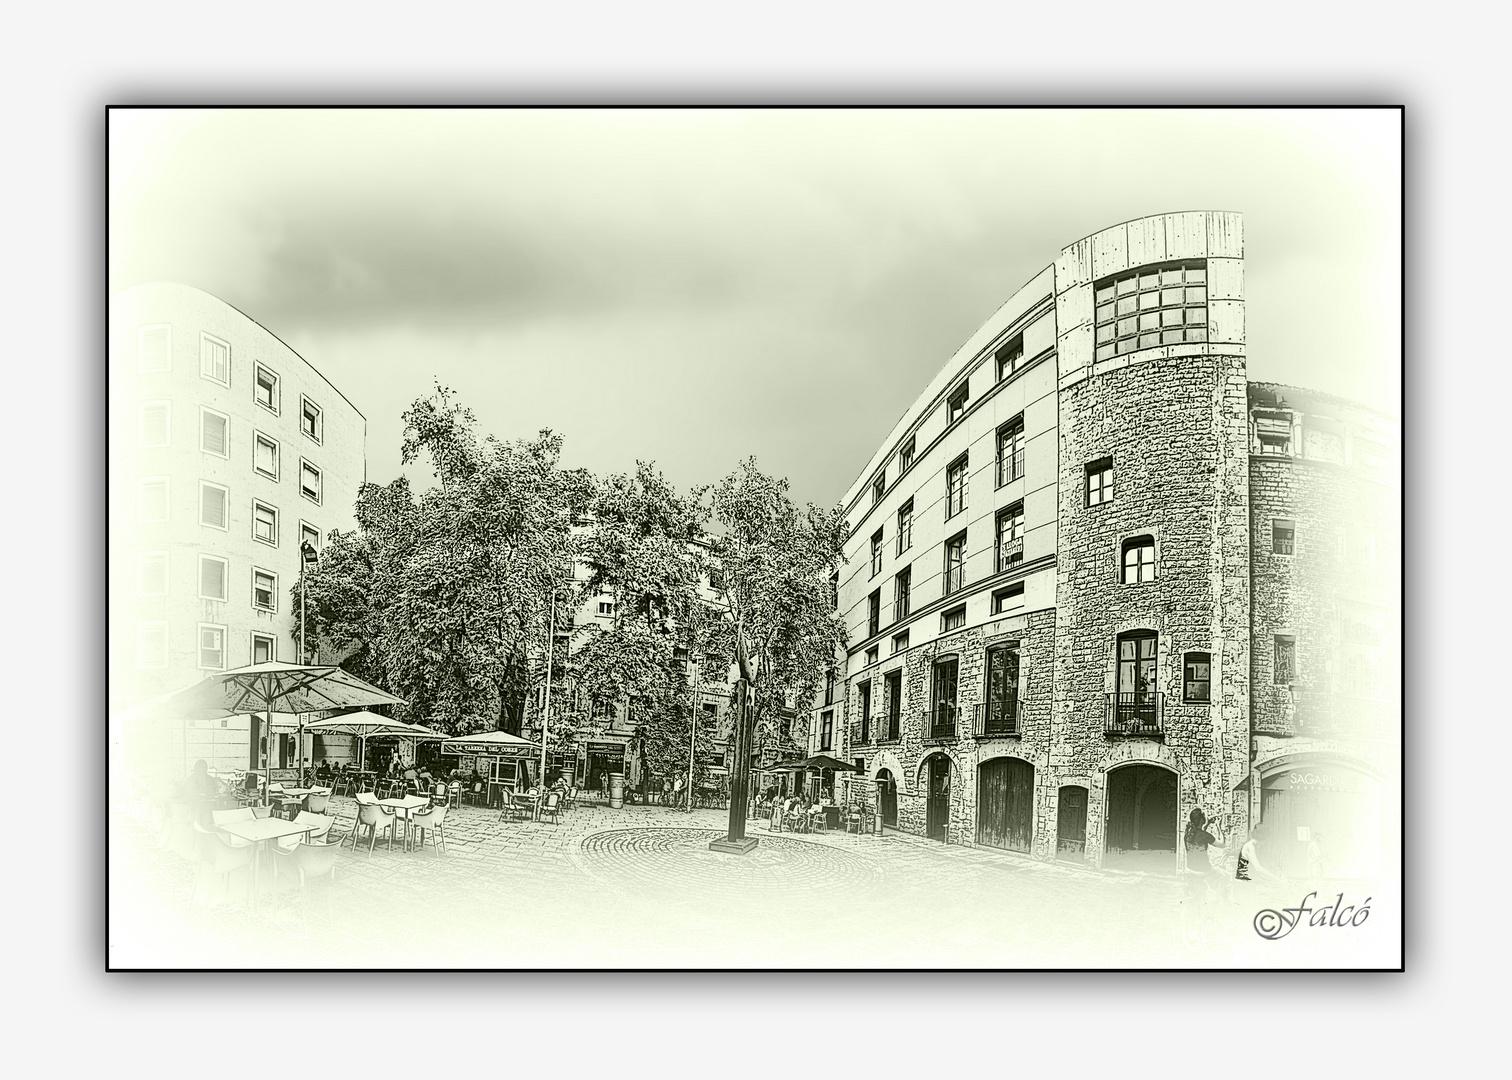 Plaça de Jacint Reventós